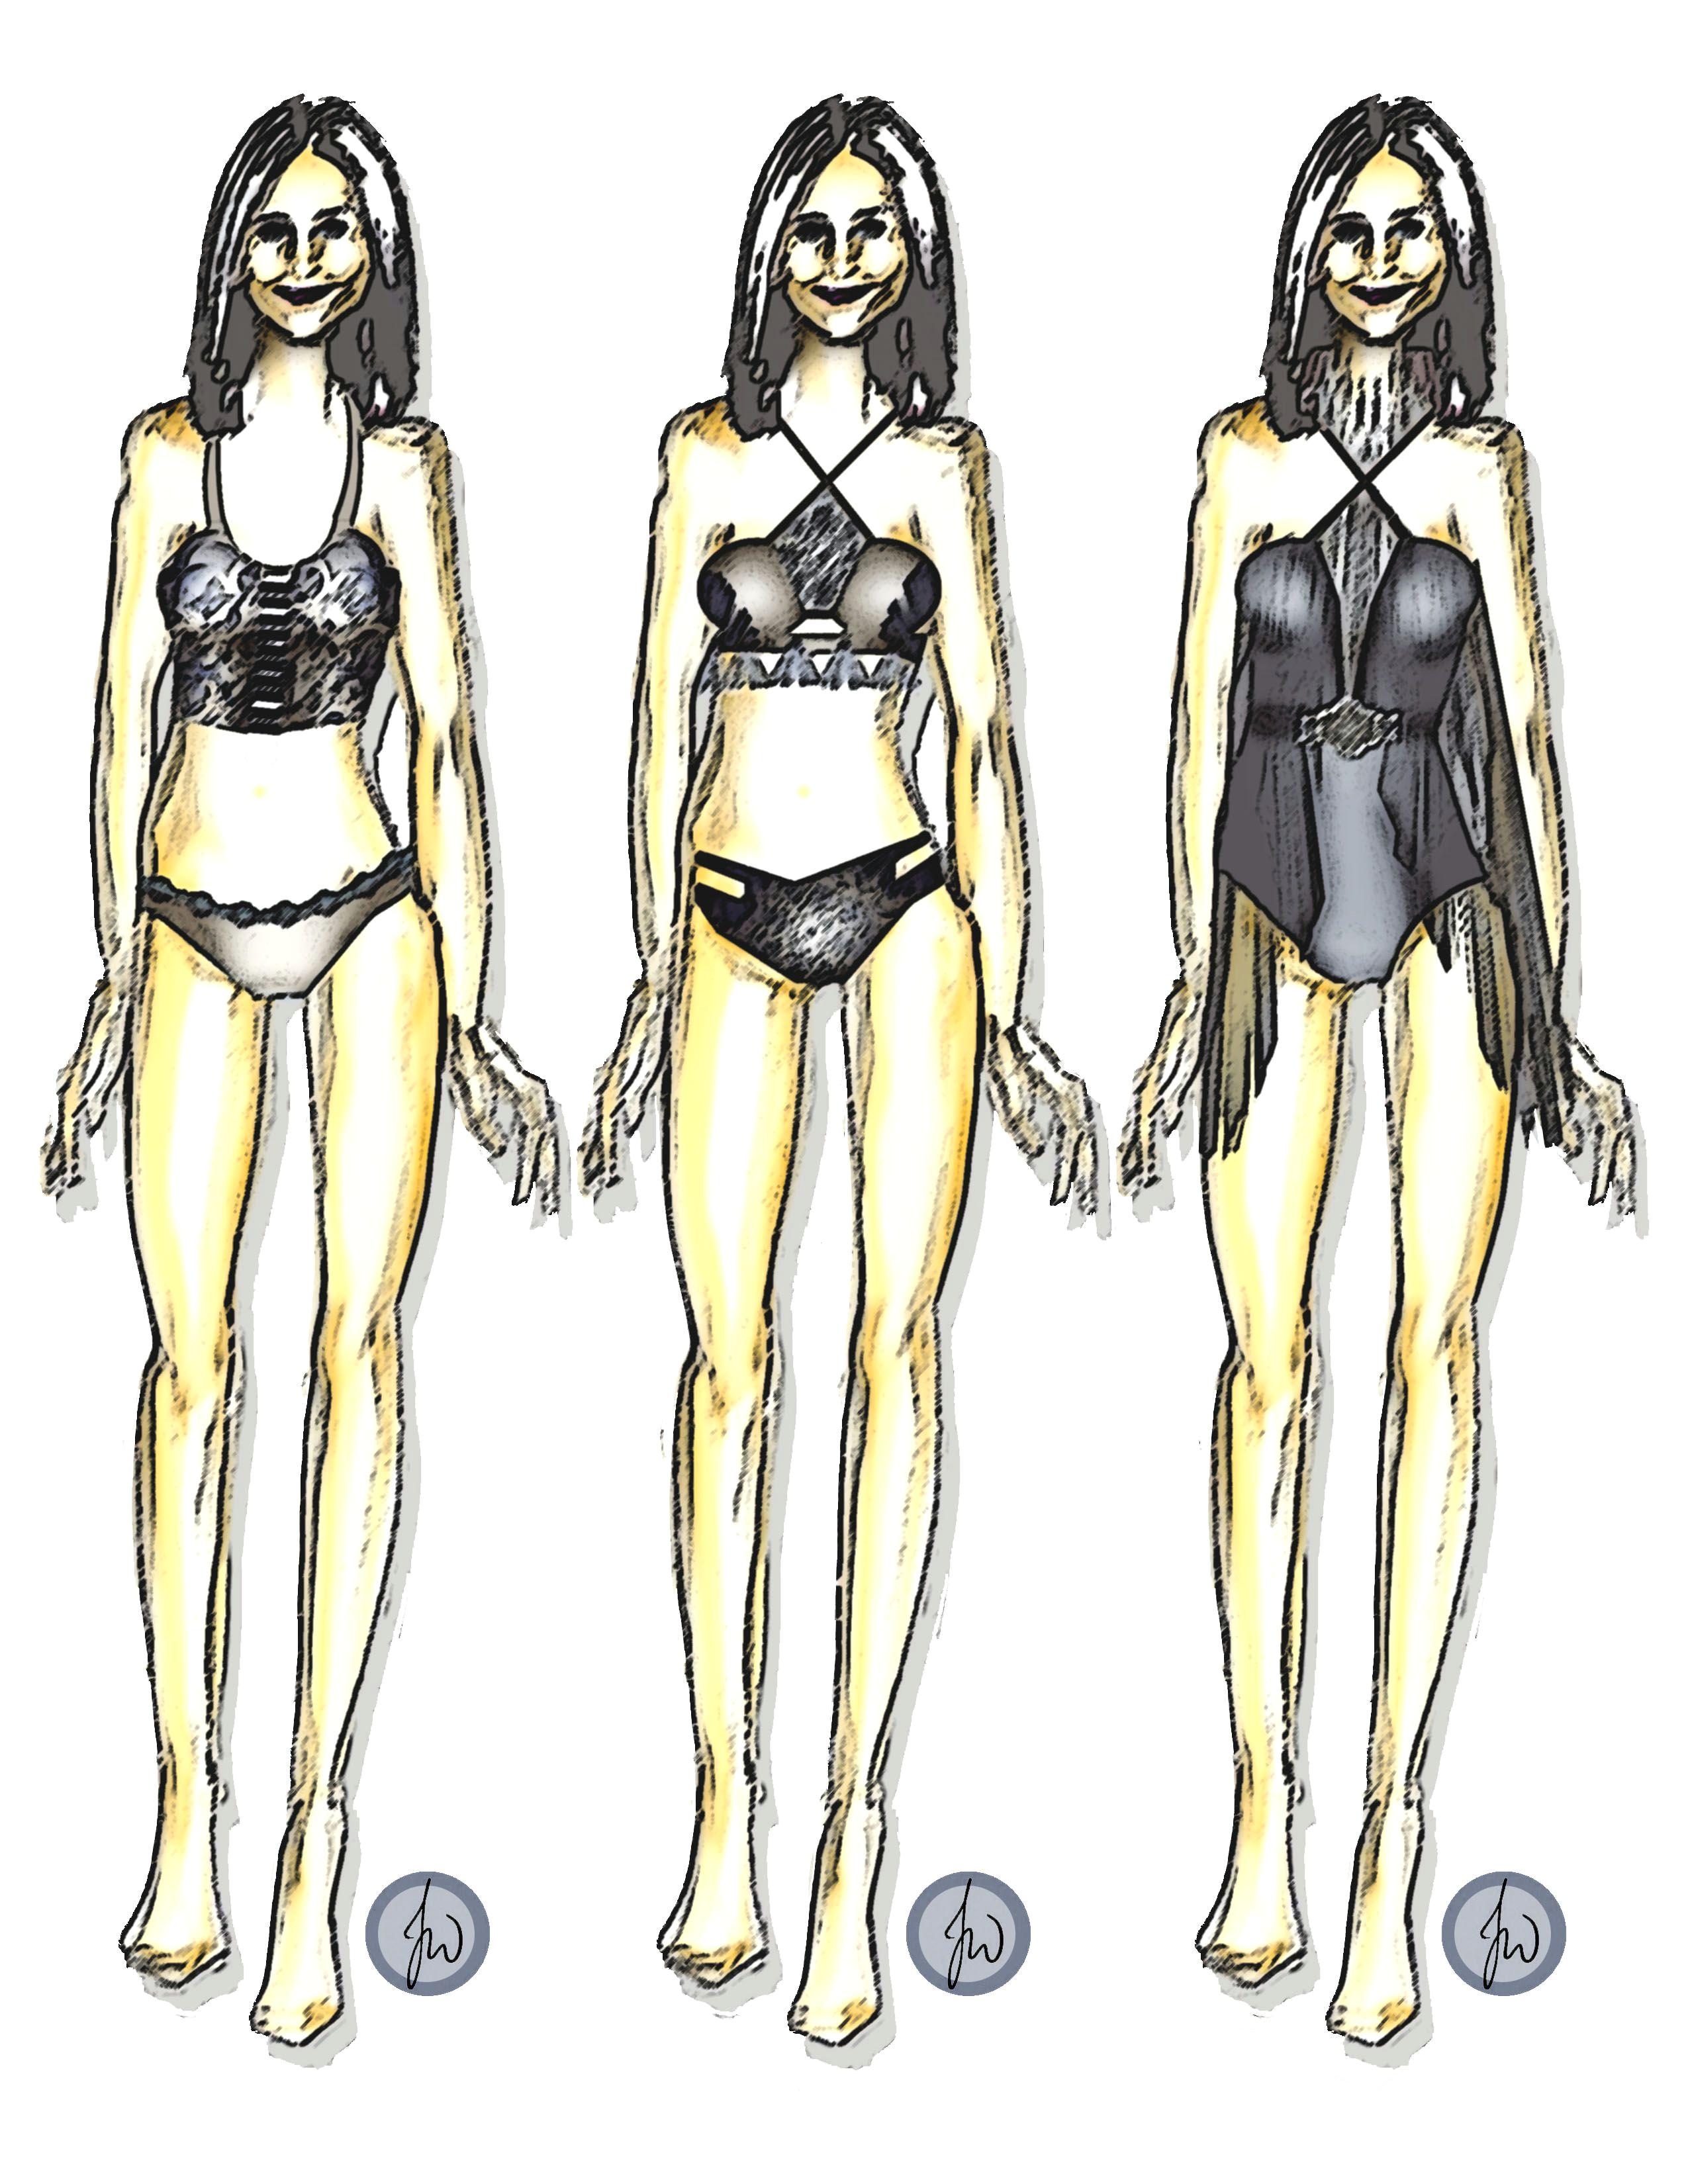 fashion fashiondesign croqui sketch illustration drawing style lingerie swimwear design style original theotherjade